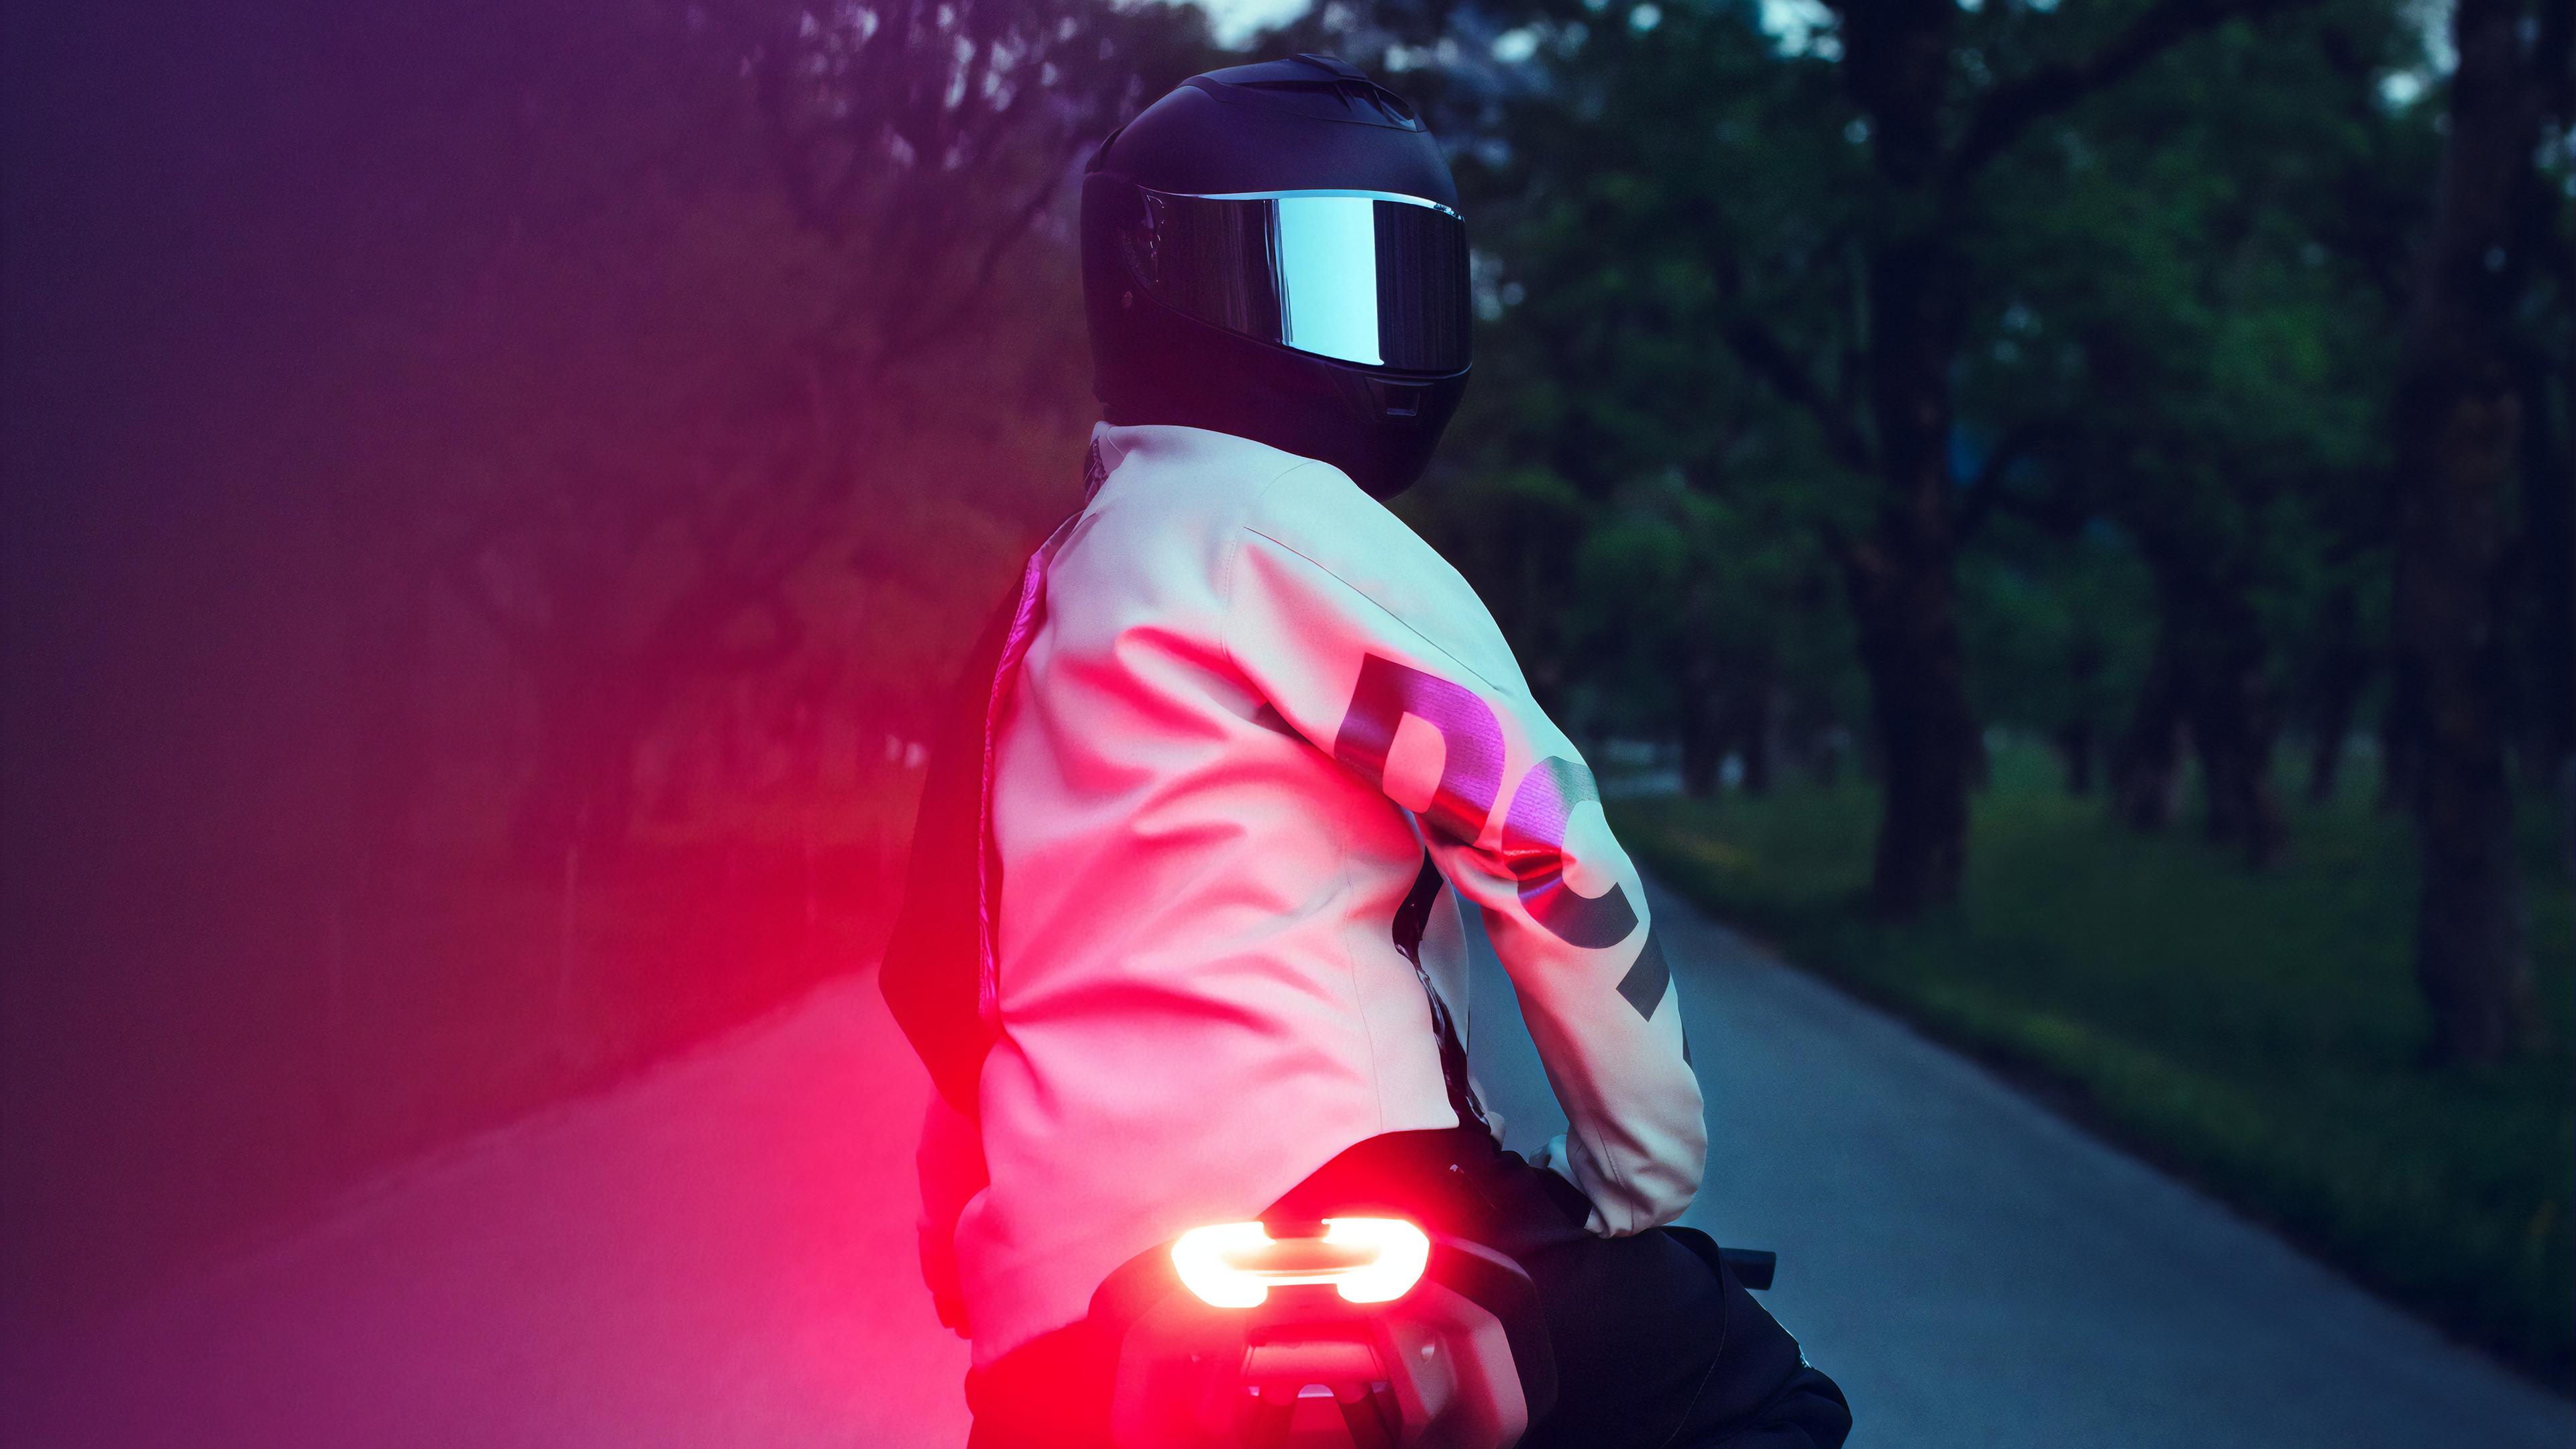 bmw vision dc roadster rider 1574943327 - BMW Vision DC Roadster Rider -